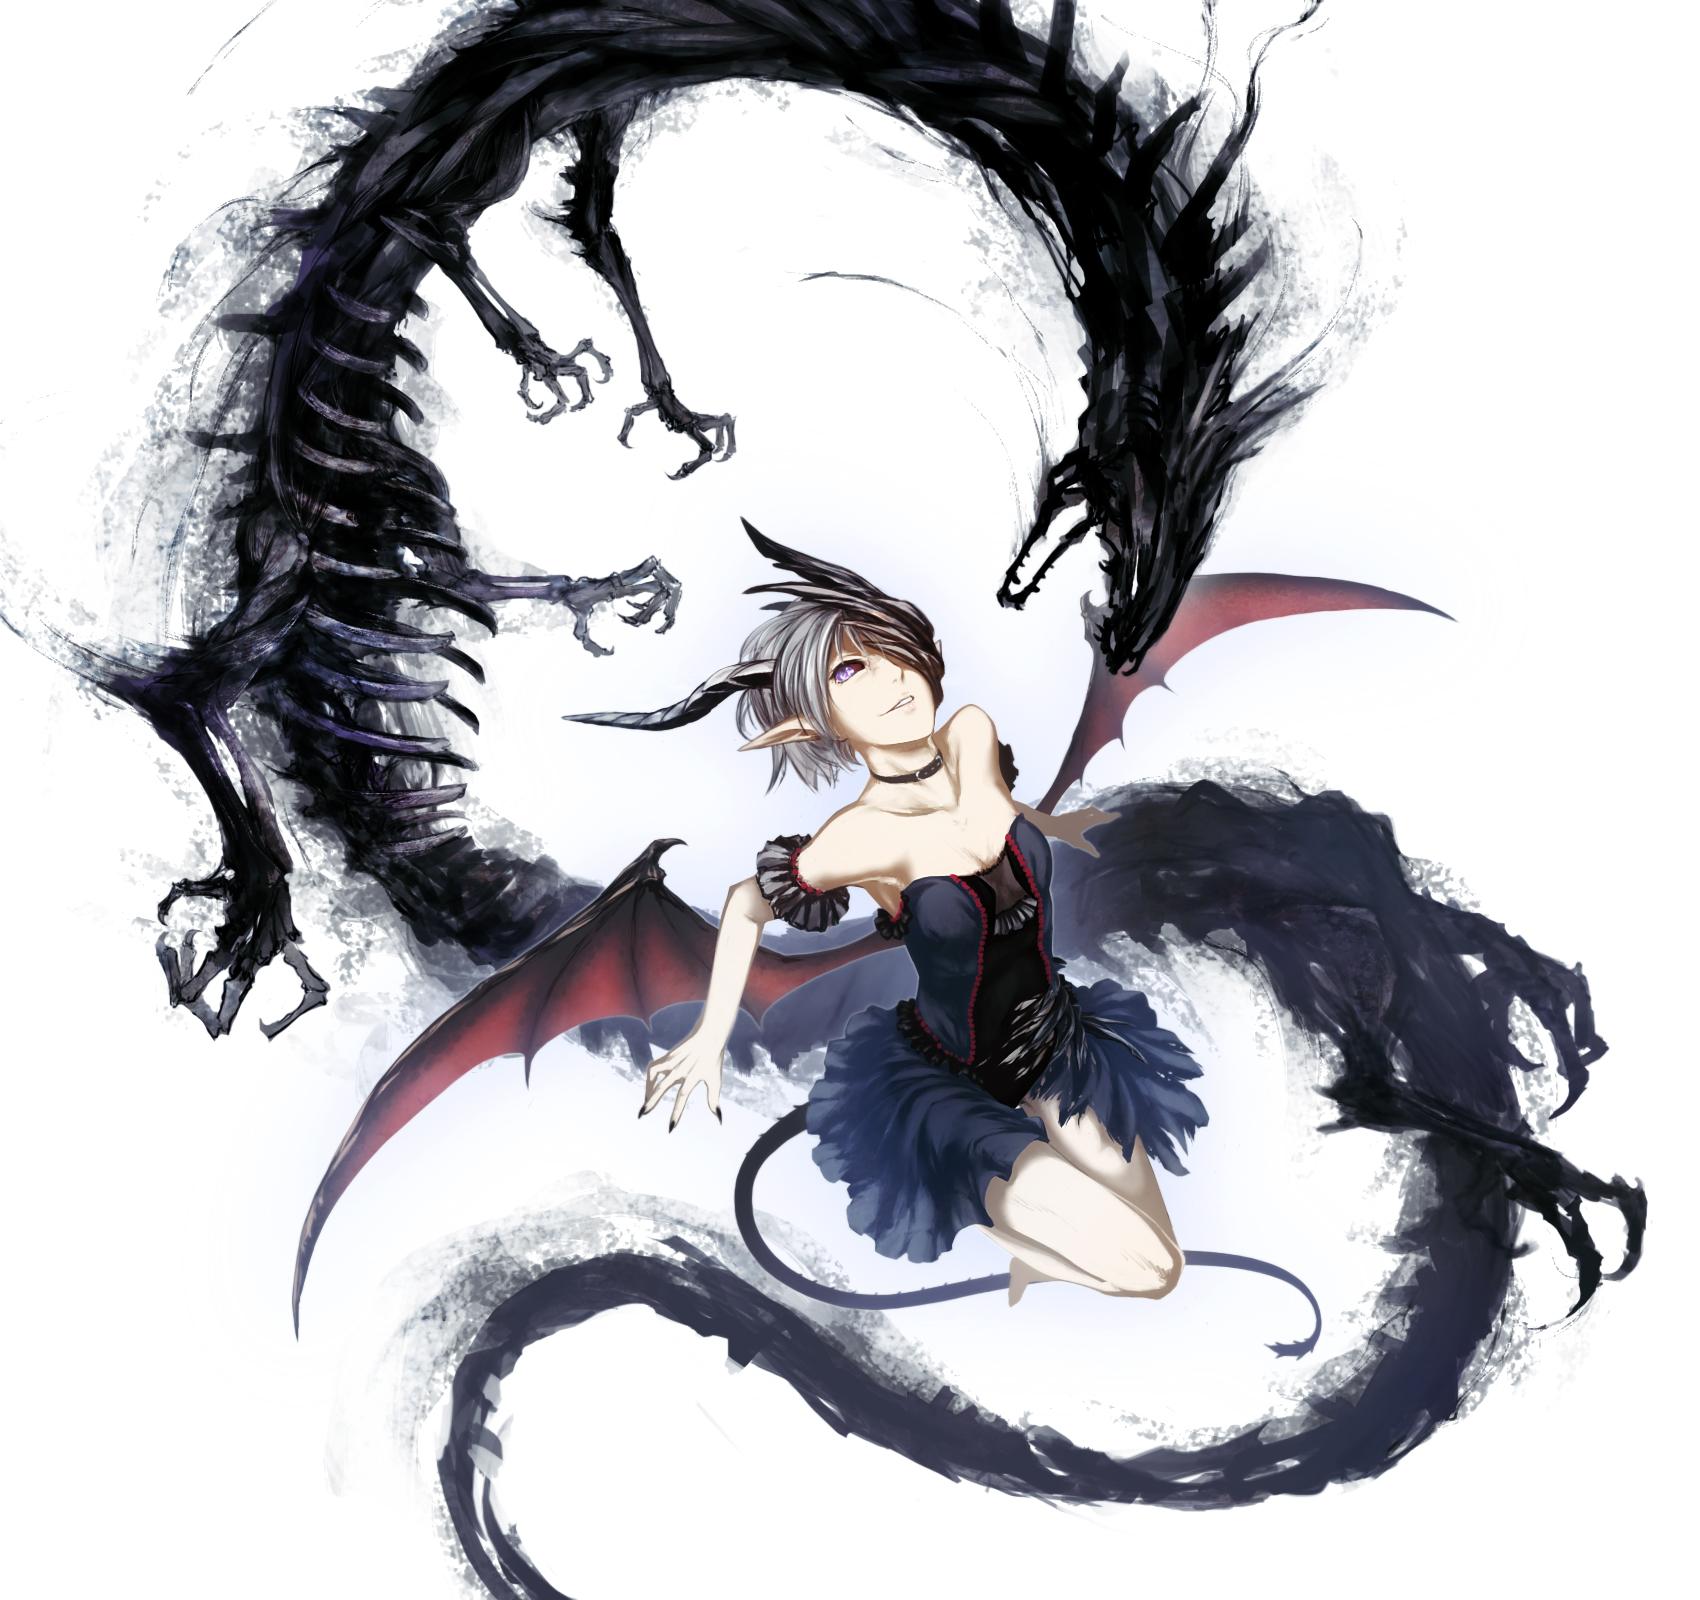 dragon horns Anime girl with